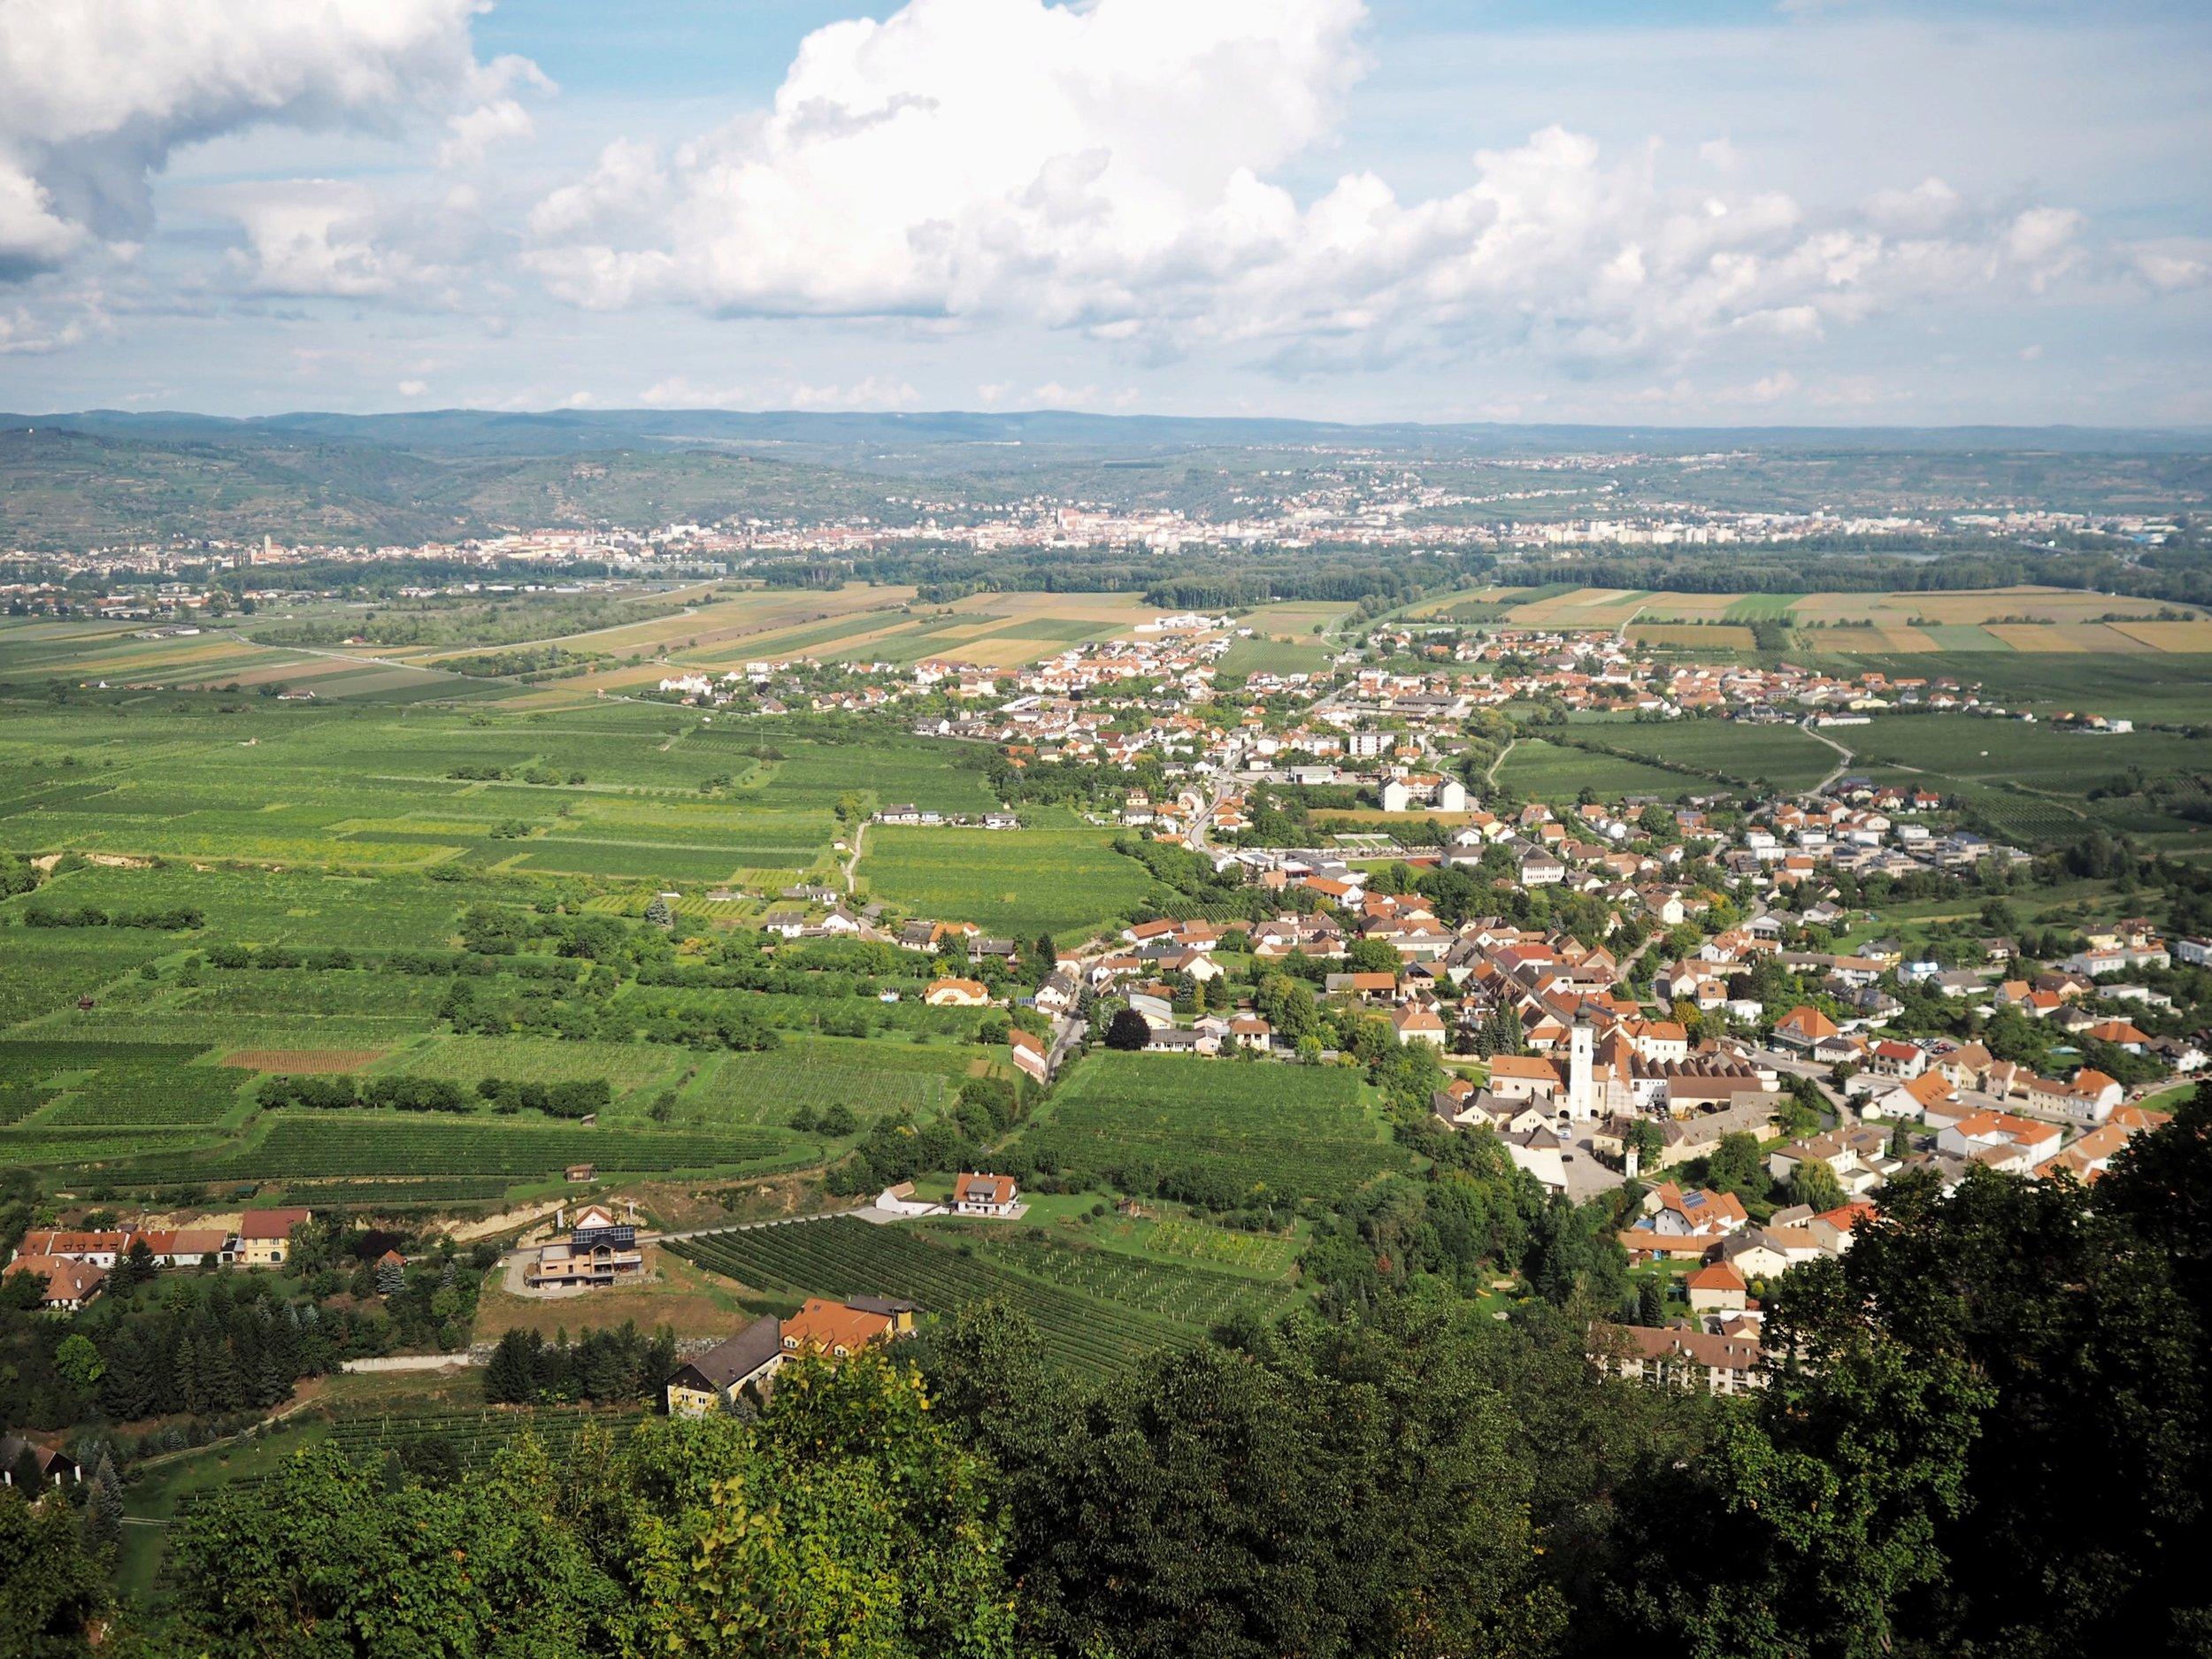 View from the GÖTTWEIG ABBEY, WACHAU VALLEY, AUSTRIA (PHOTO BY BIANCA BUSTOS-VELAZQUEZ)